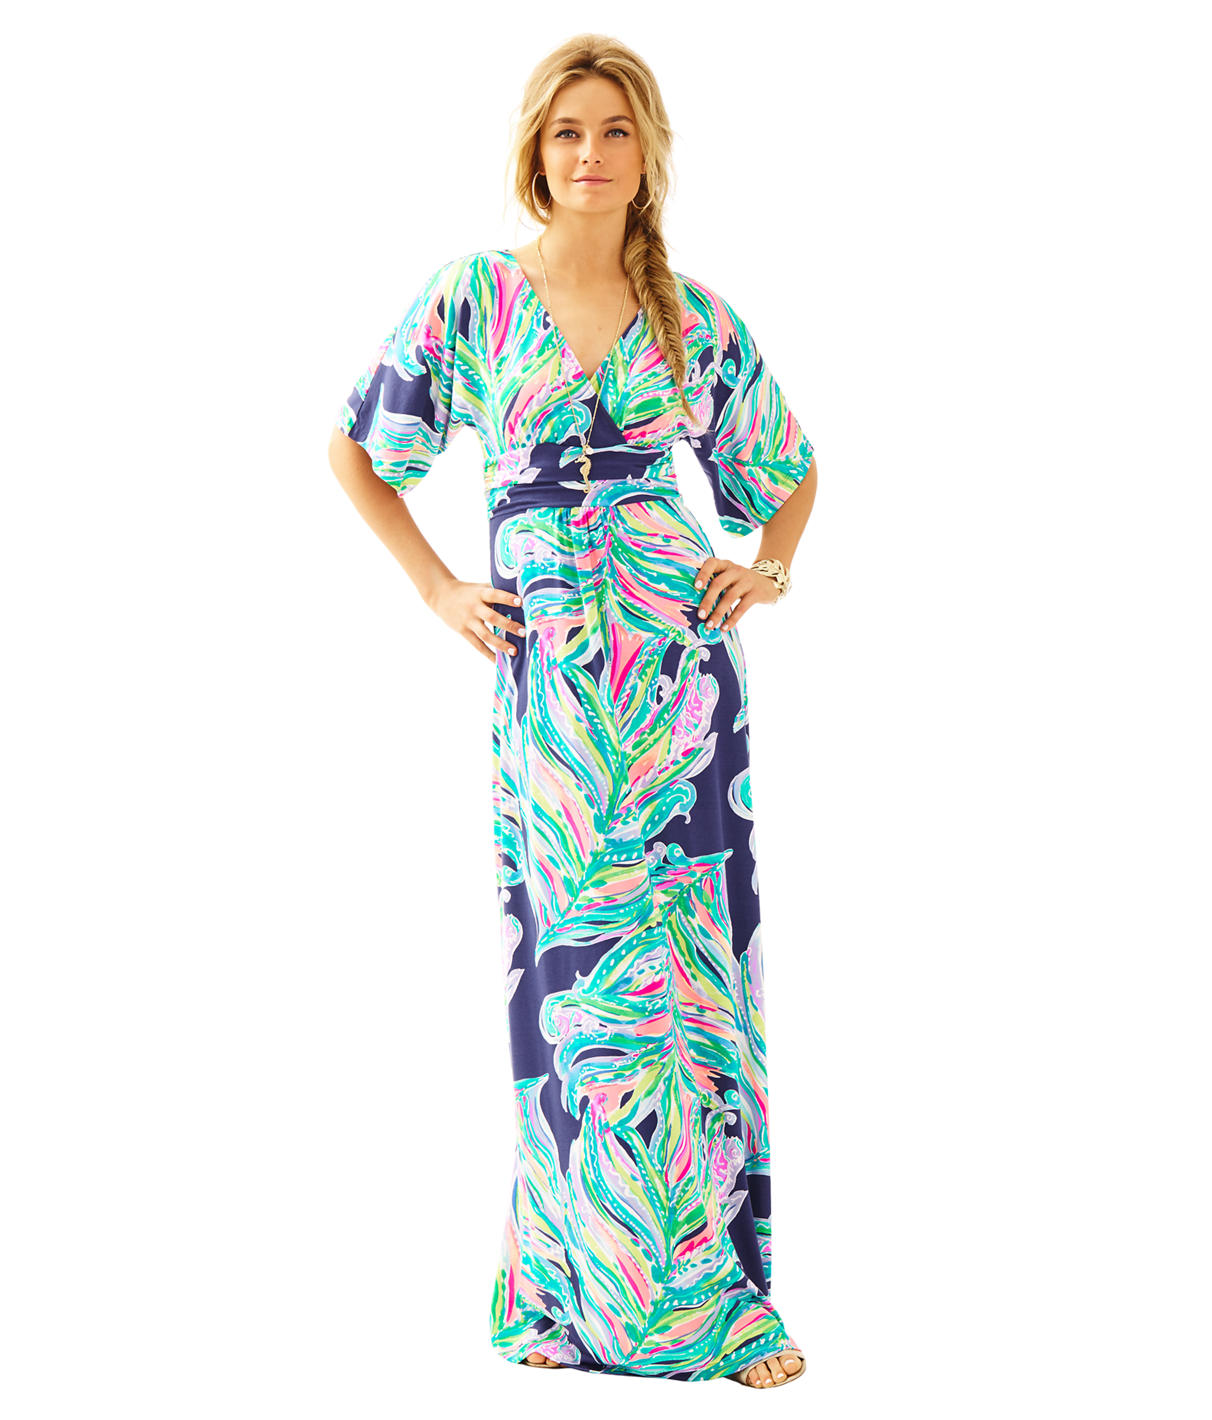 Lilly Pulitzer Lilly Pulitzer Womens Parigi Maxi Dress